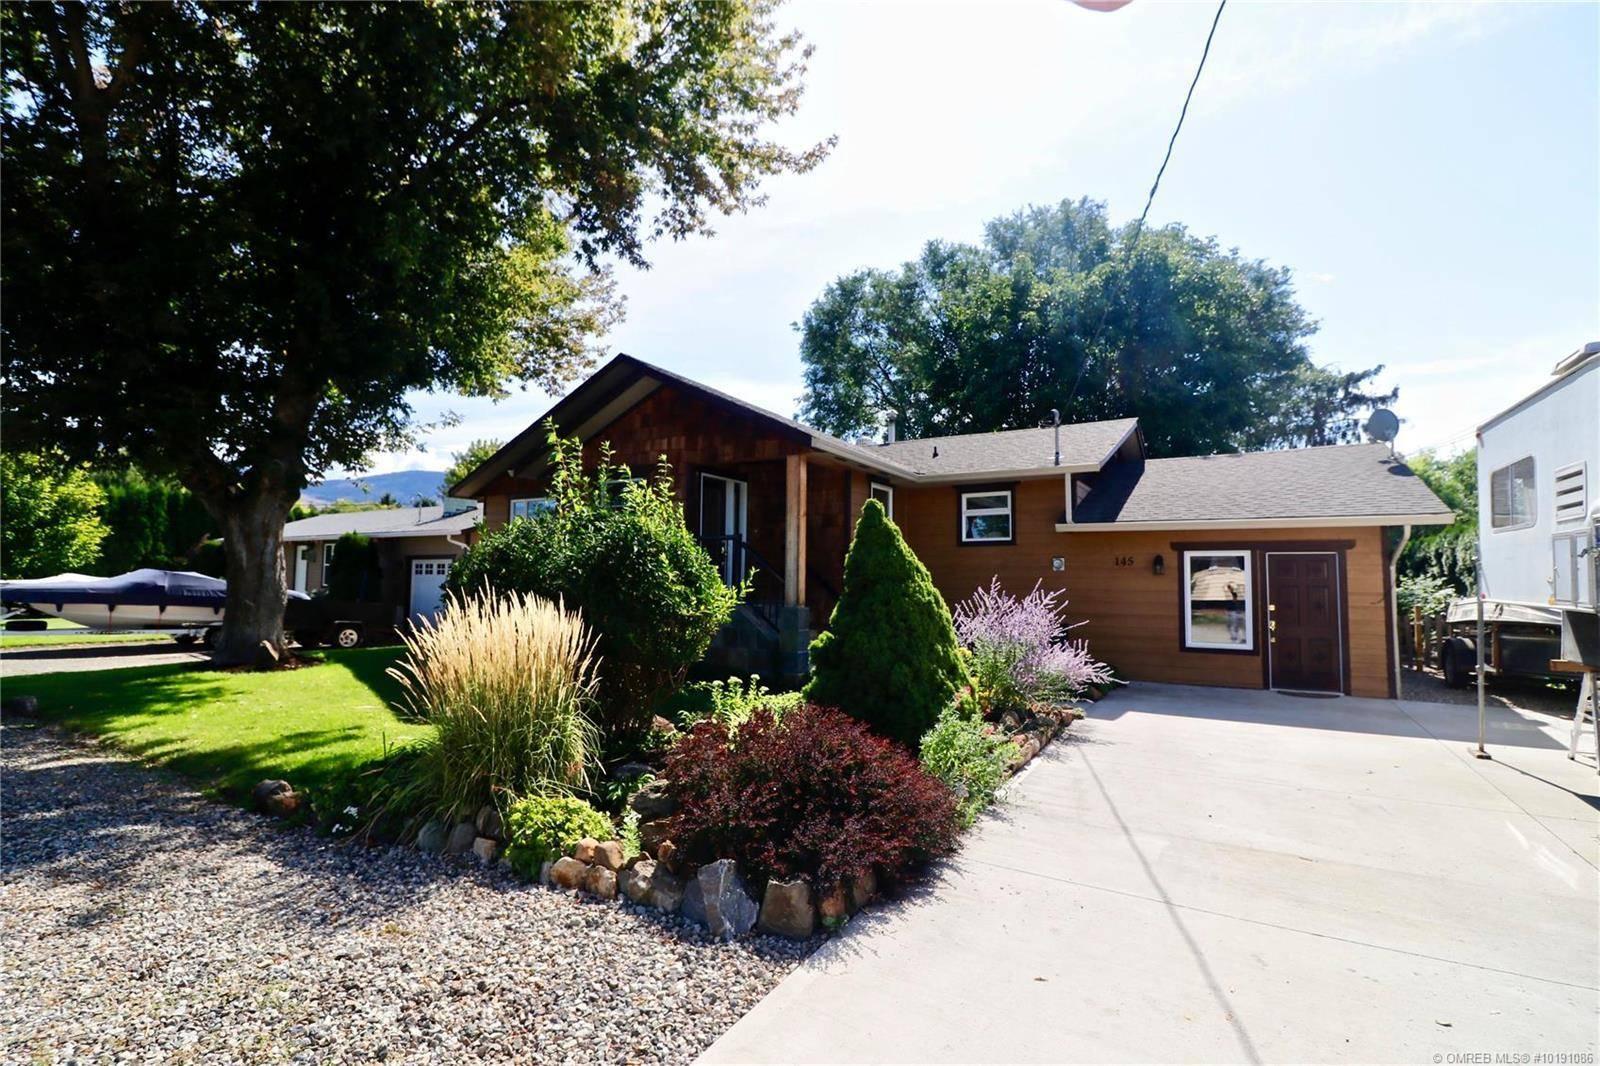 House for sale at 145 Rains Rd Kelowna British Columbia - MLS: 10191086